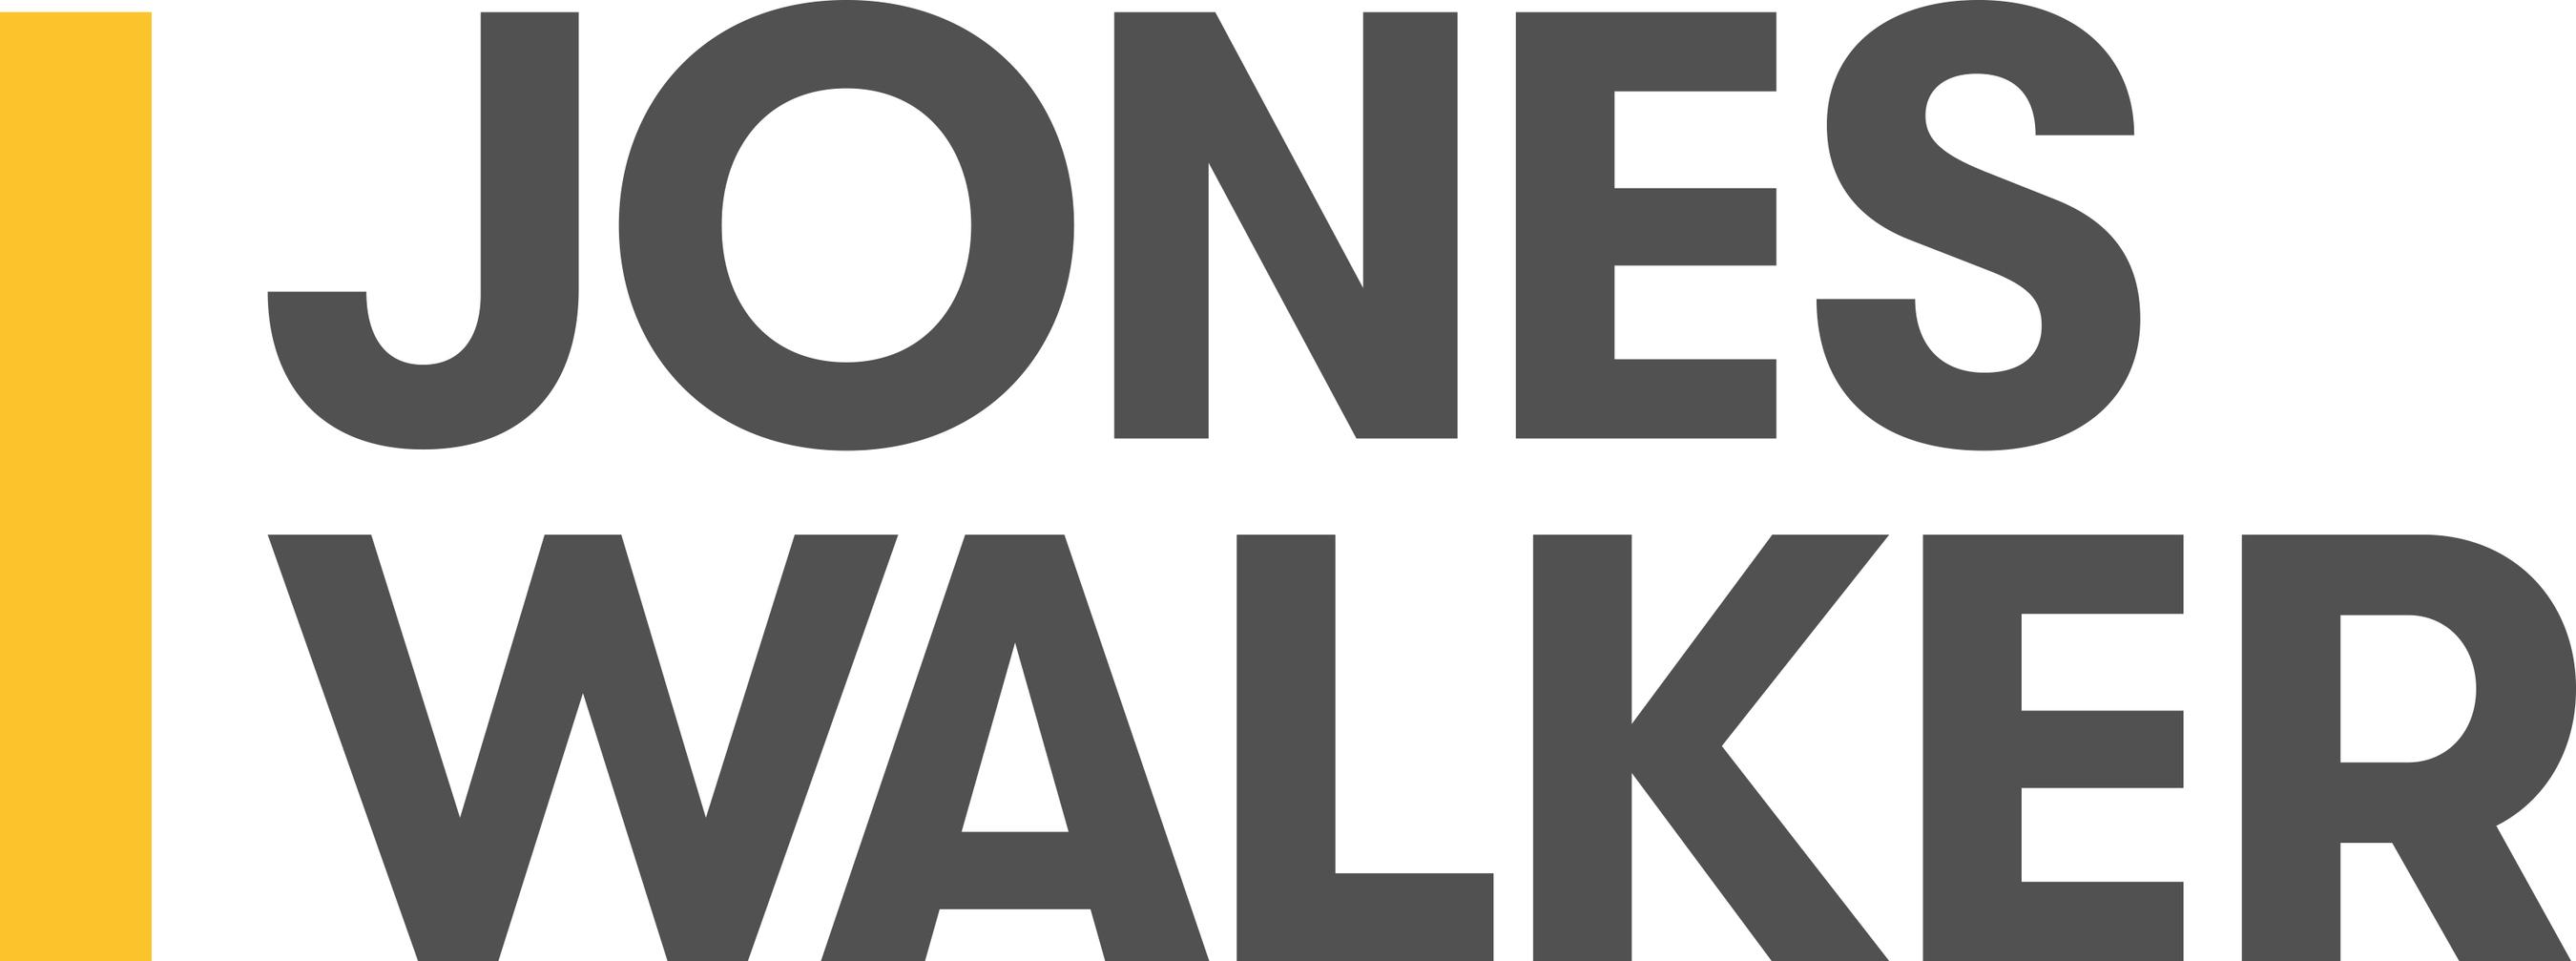 Jones Walker logo (PRNewsfoto/Jones Walker LLP)